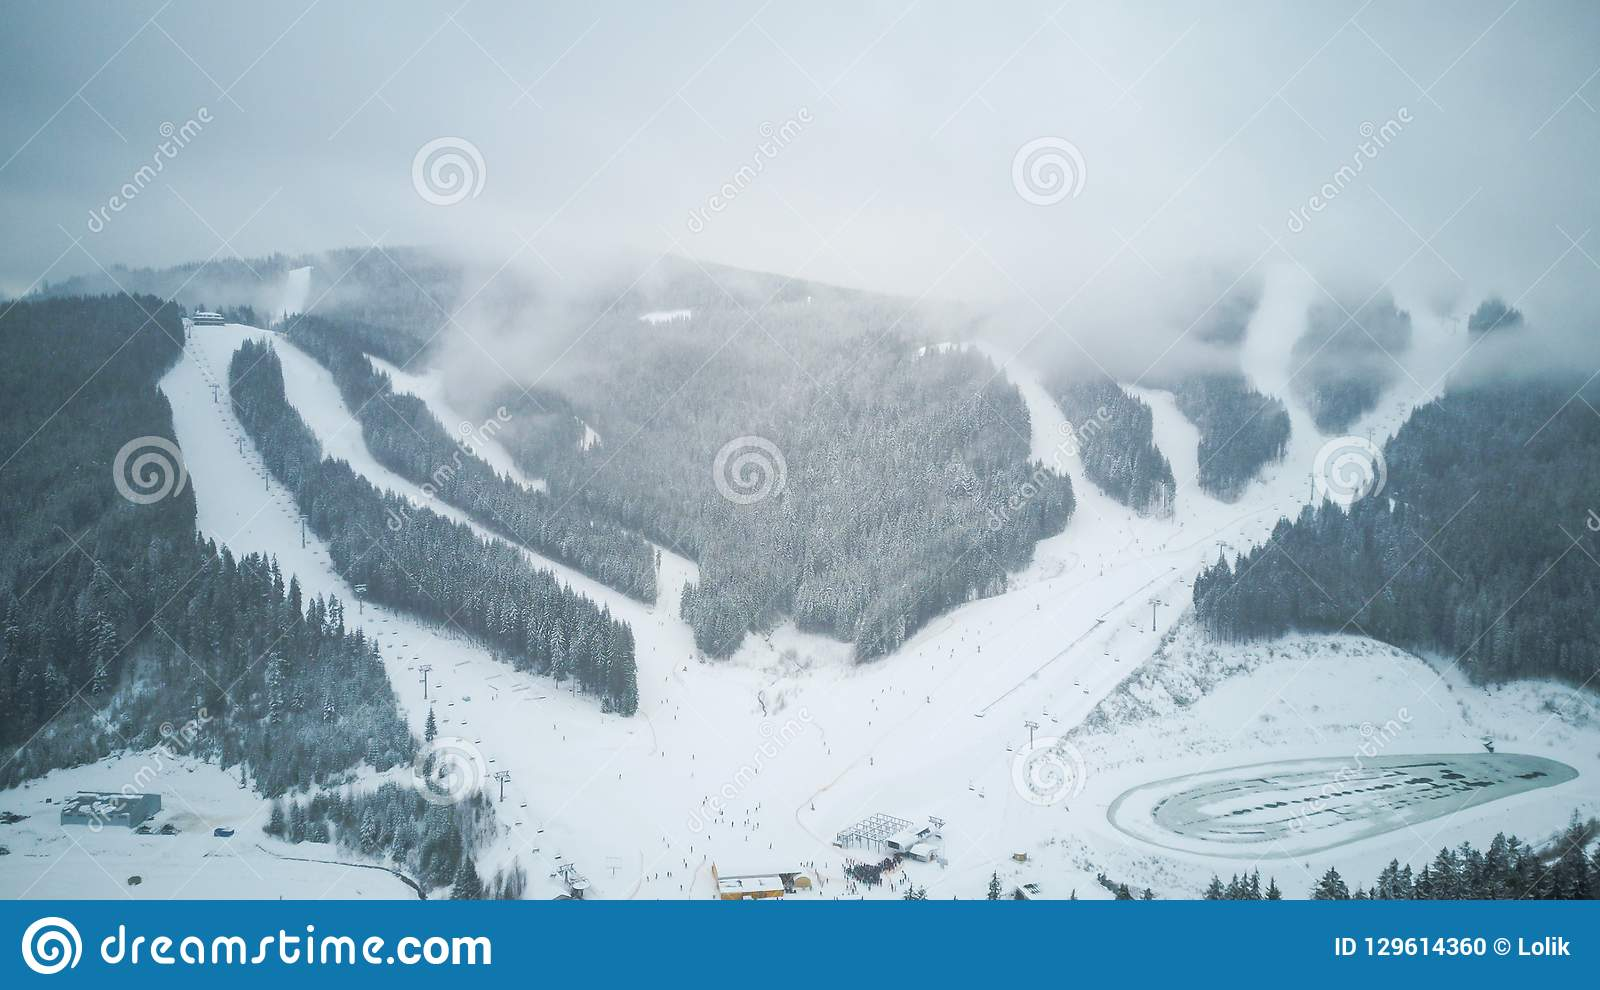 Aerial view of a ski resort in the Carpathians, Bukovel